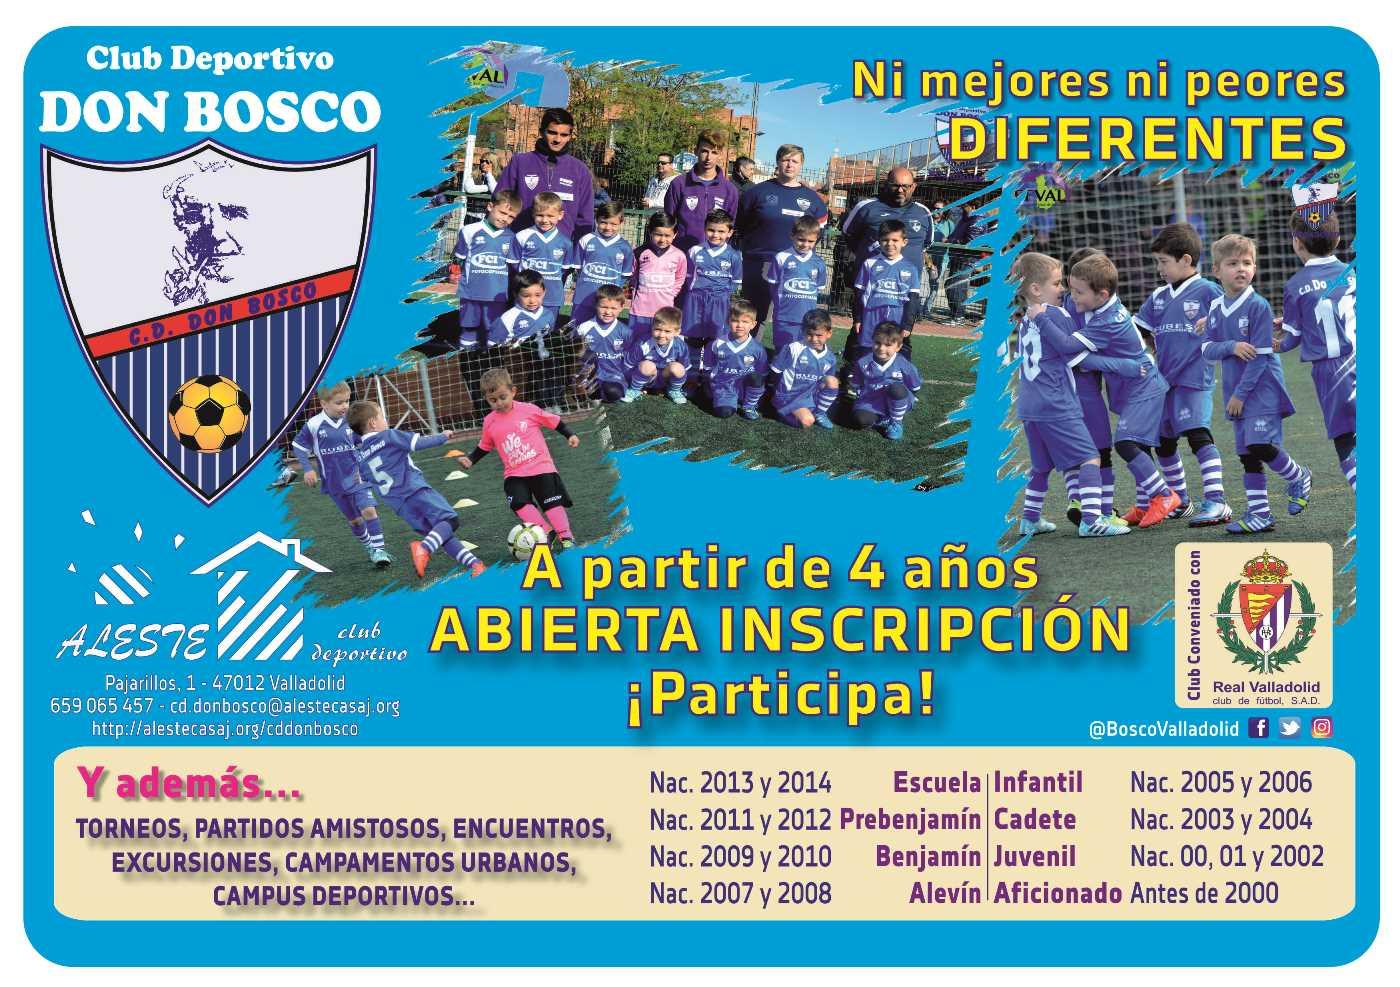 promocion-CD-bosco-1